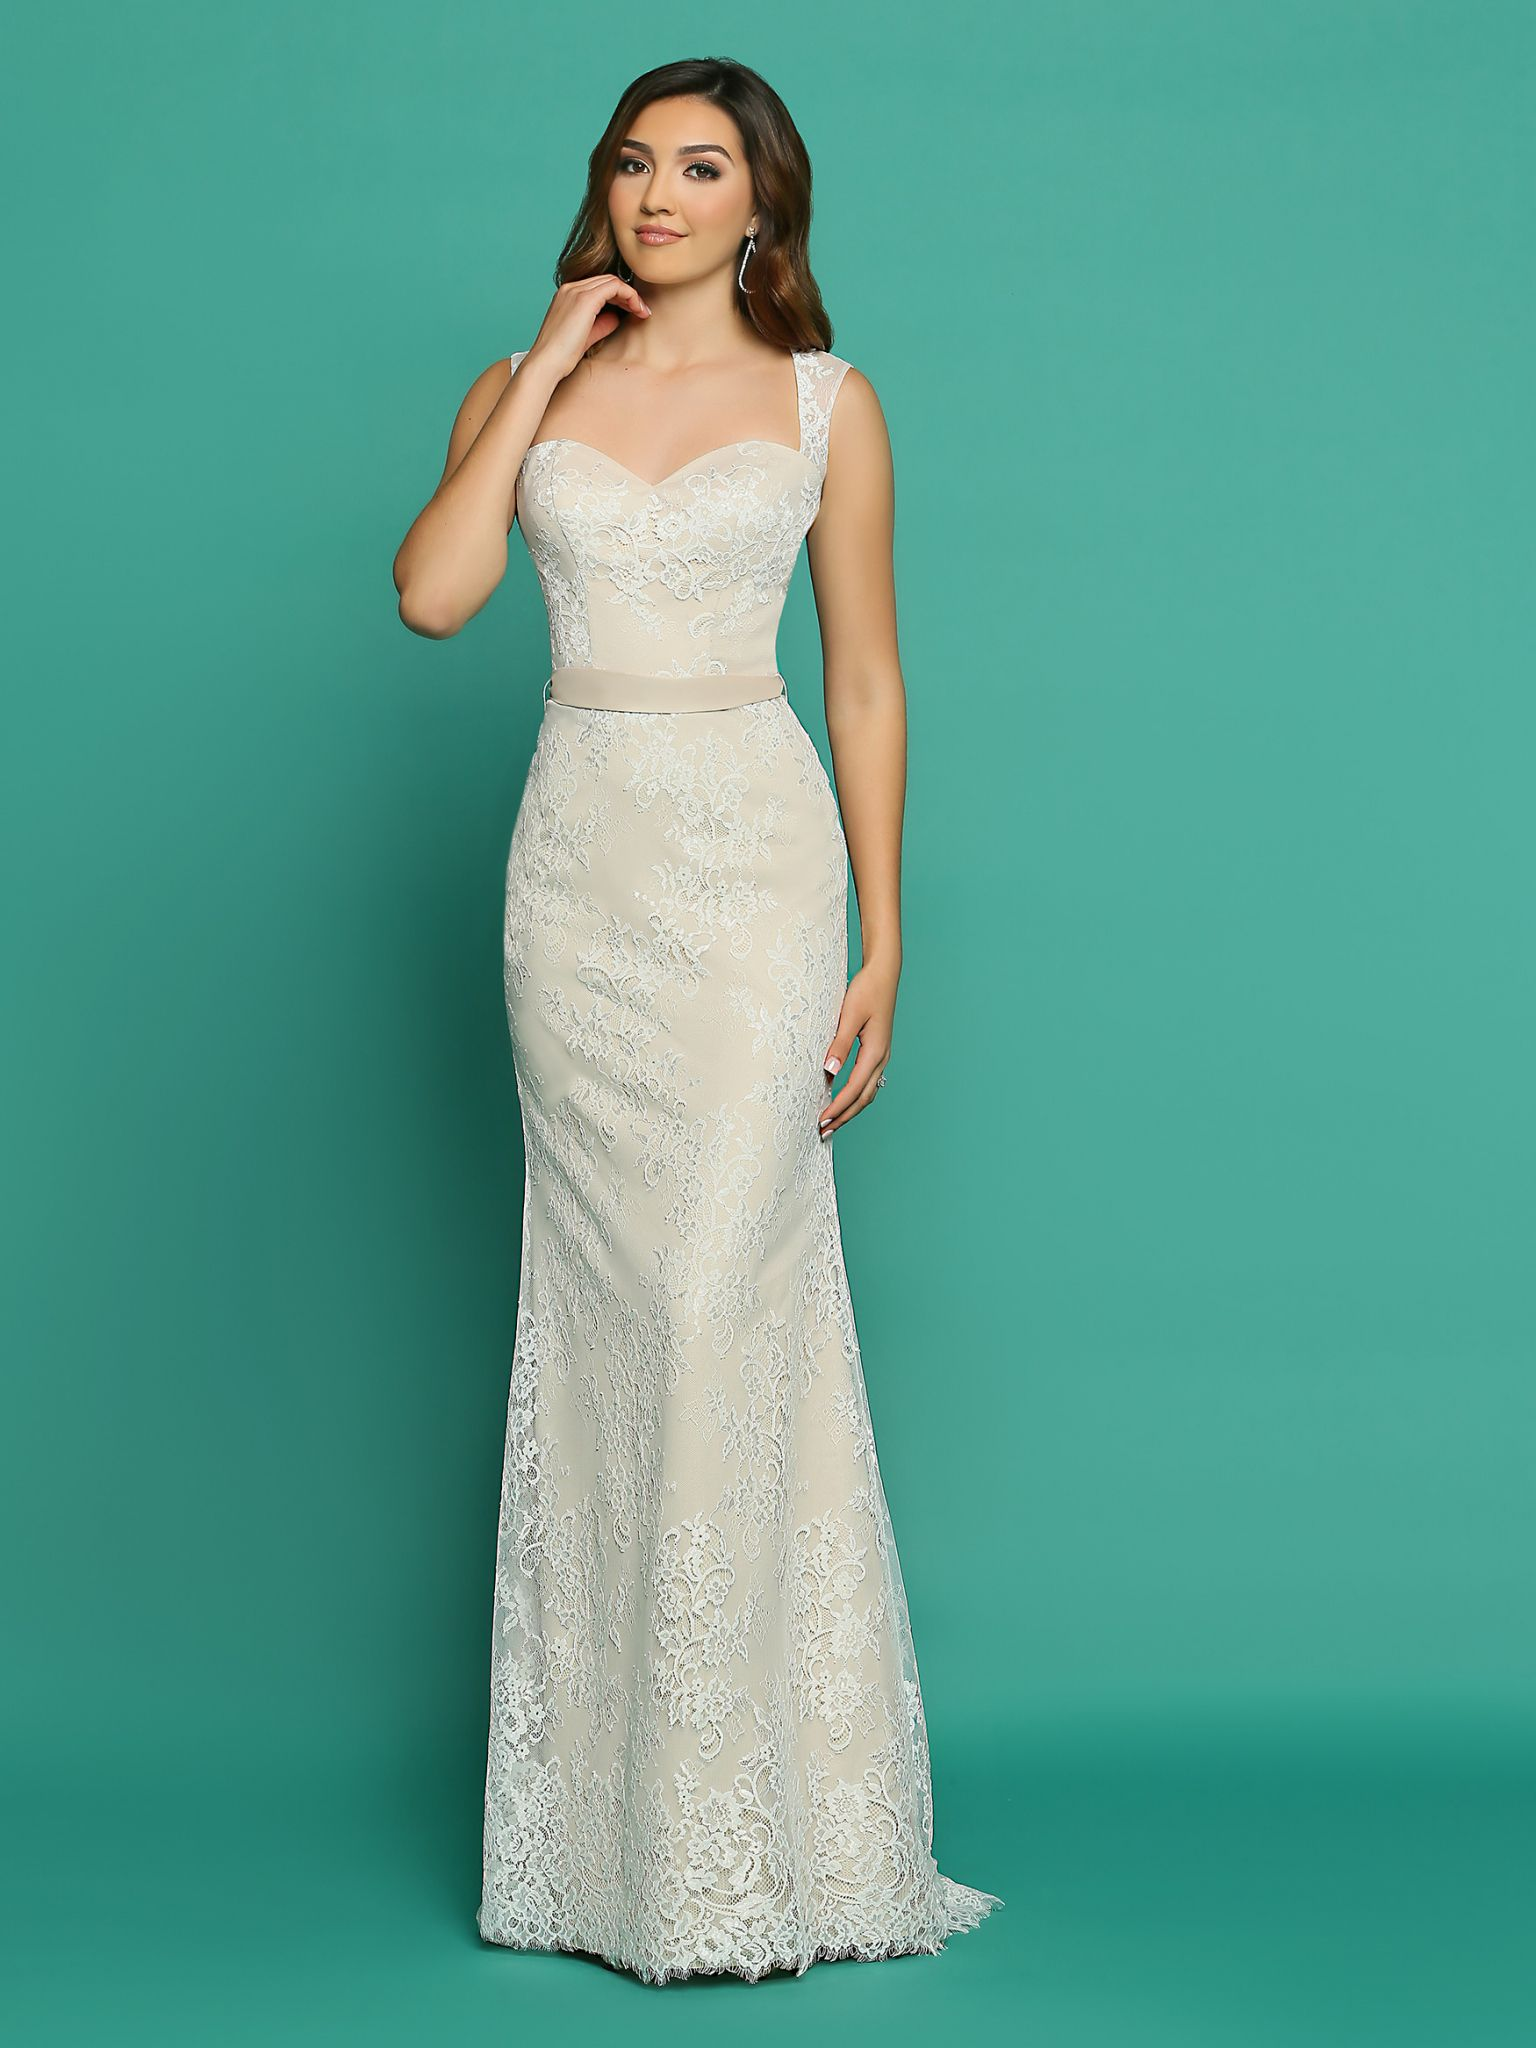 Simple Informal Wedding Dresses - Plus Size Dresses for Wedding ...